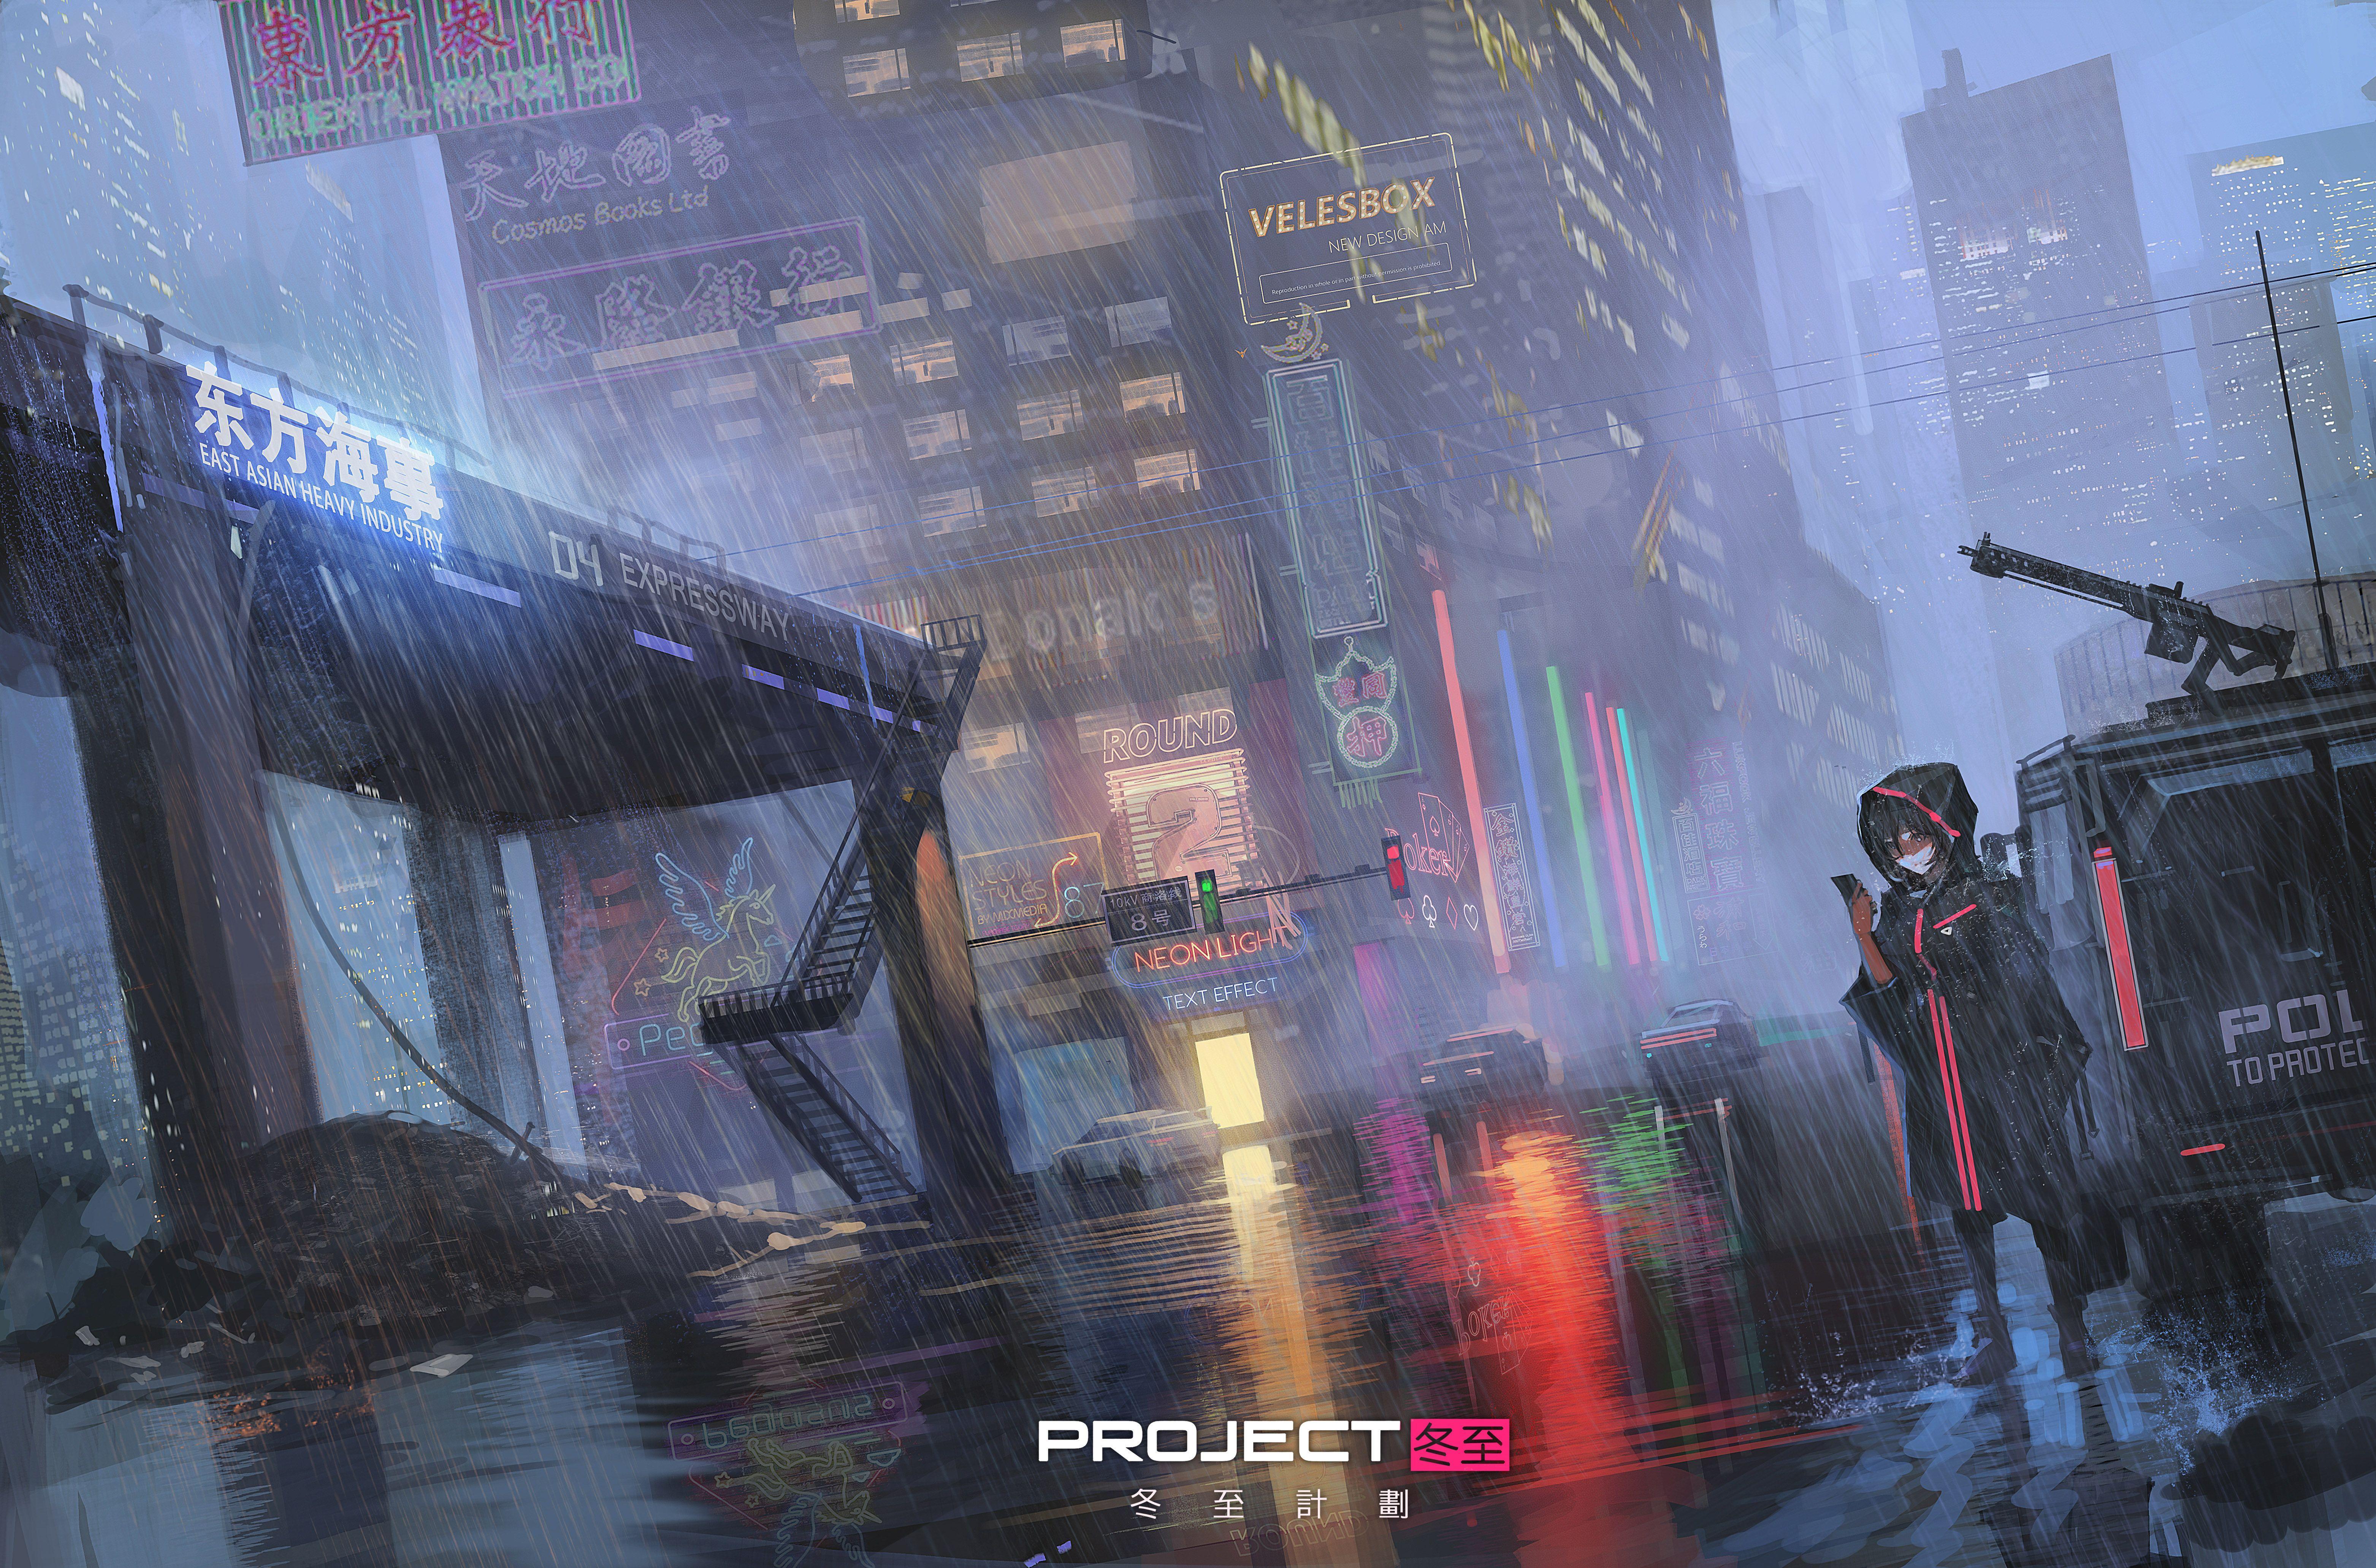 Cyberpunk Anime Wallpapers Top Free Cyberpunk Anime Backgrounds Wallpaperaccess